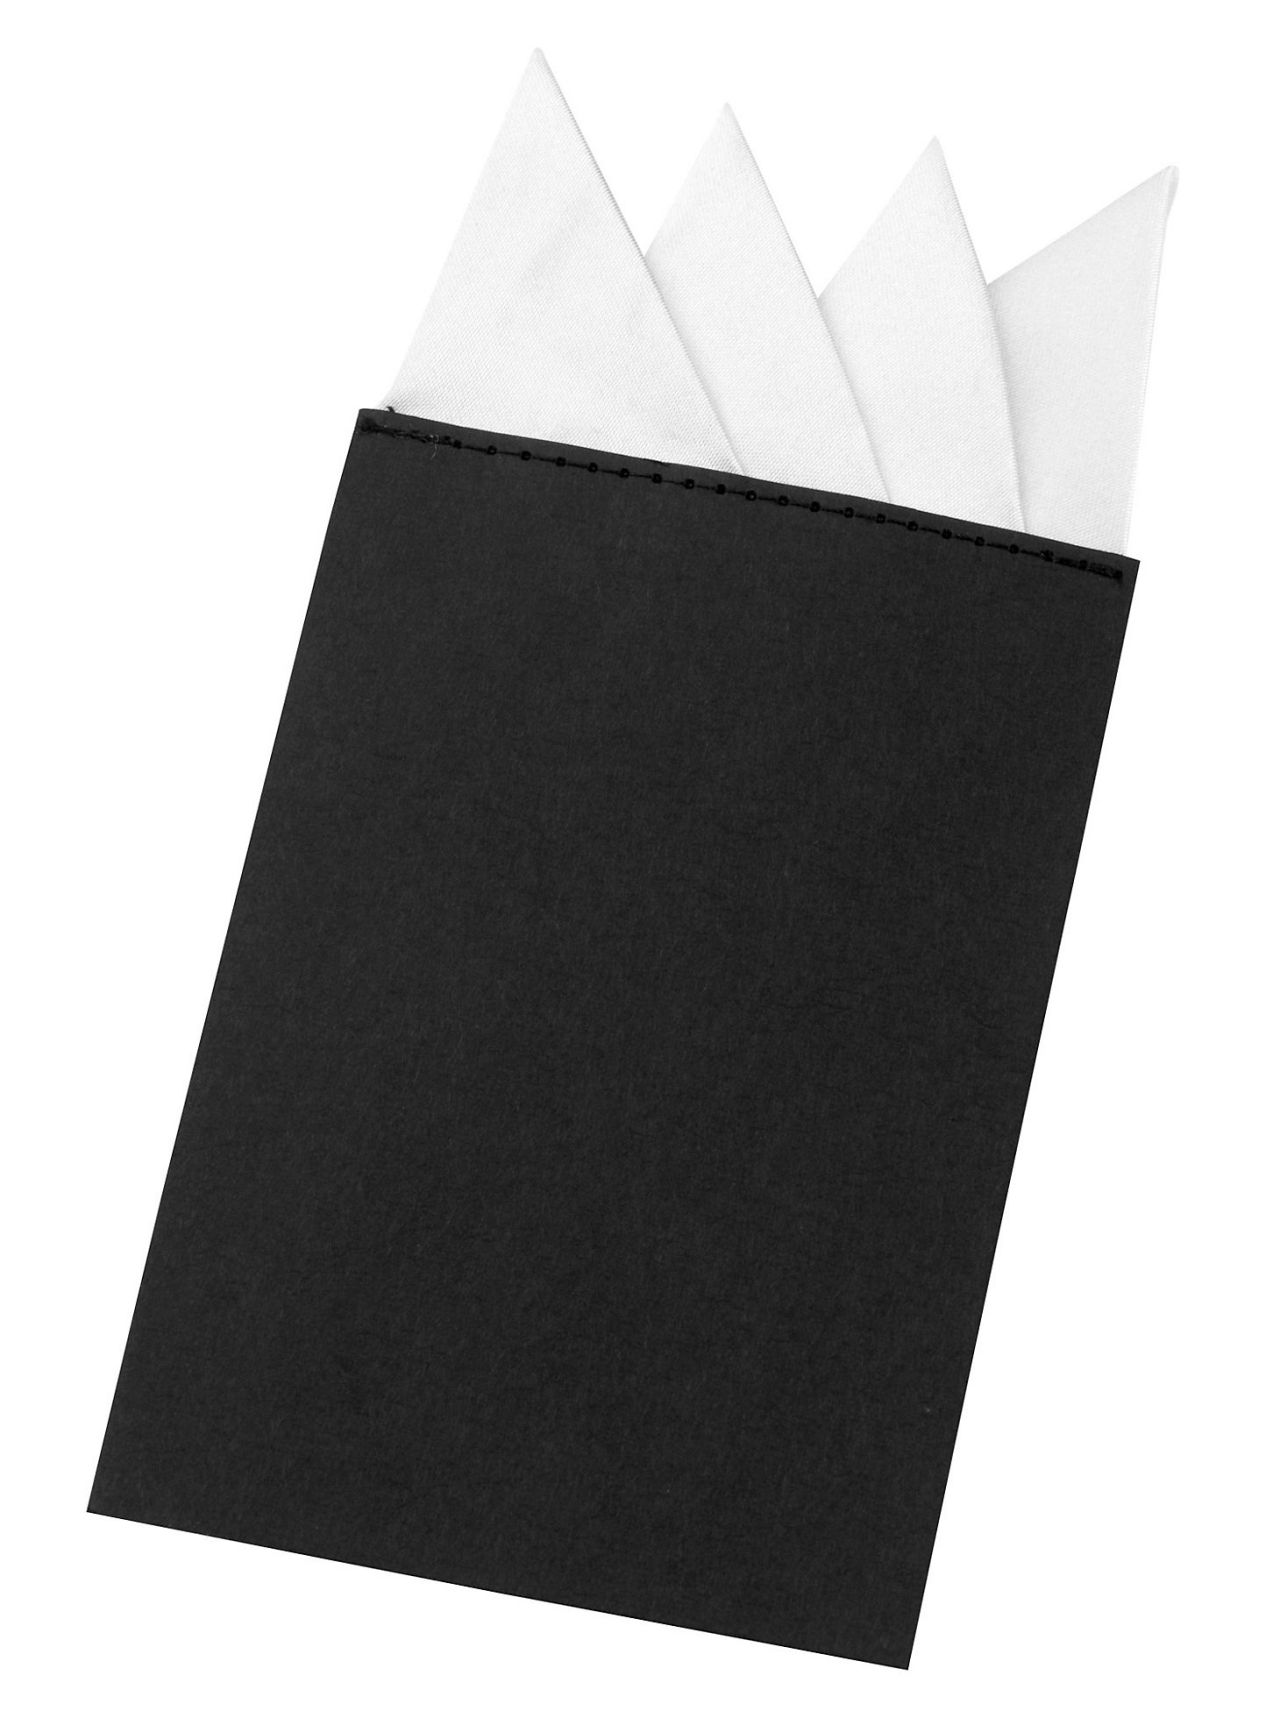 The Pre-Folded Pocket Square